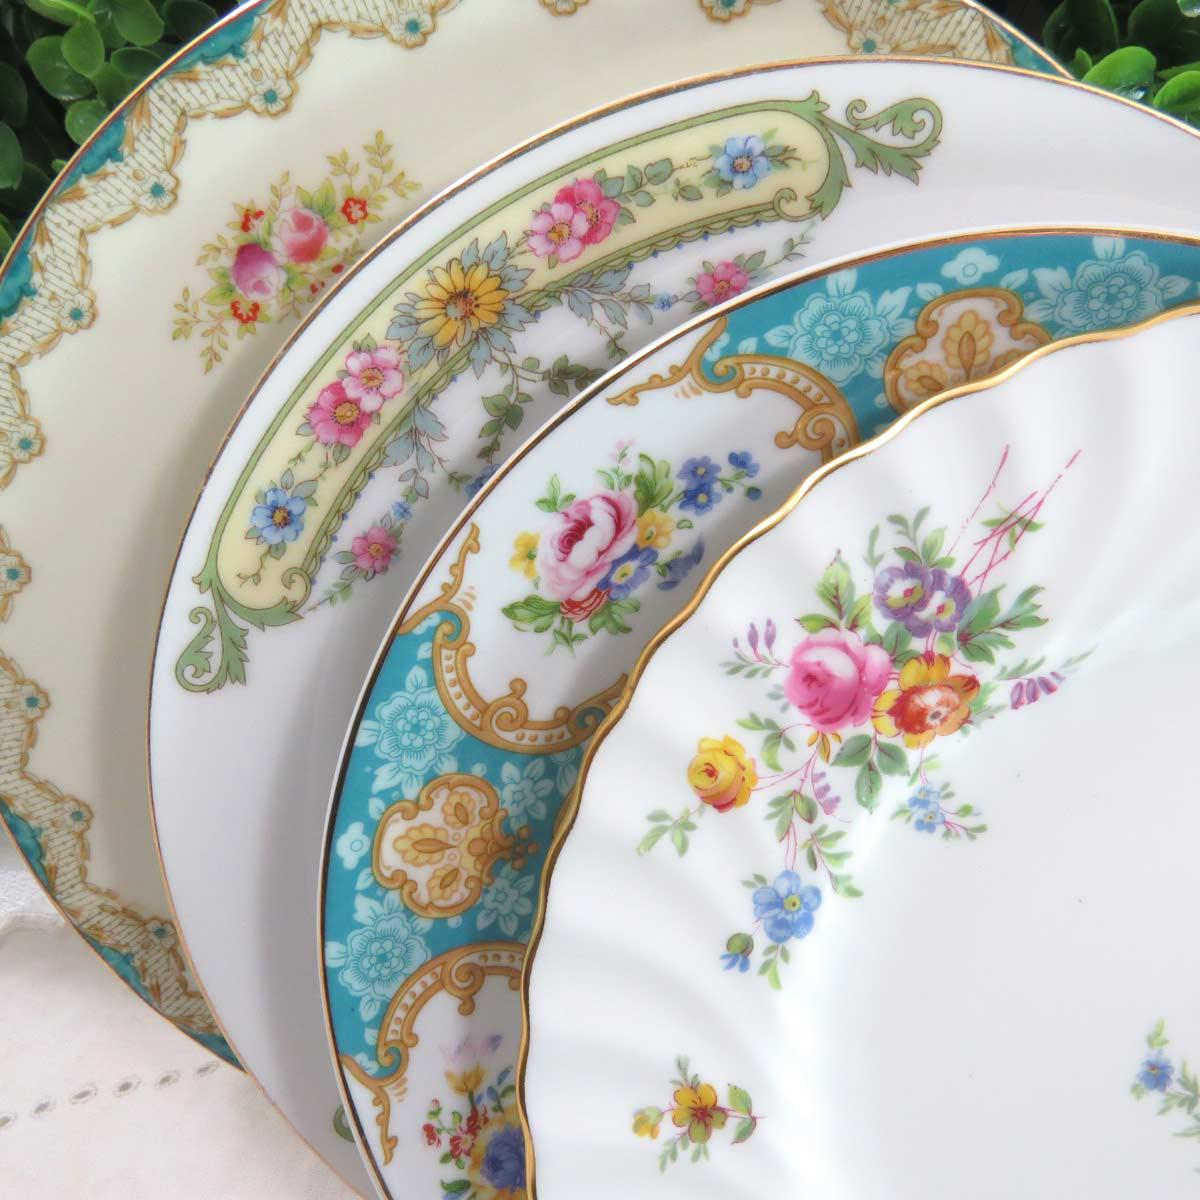 Vintage Mismatched China Dessert Plates - Set of 4 - Image 2 of 8 & Vintage Mismatched China Dessert Plates - Set of 4 | Chairish